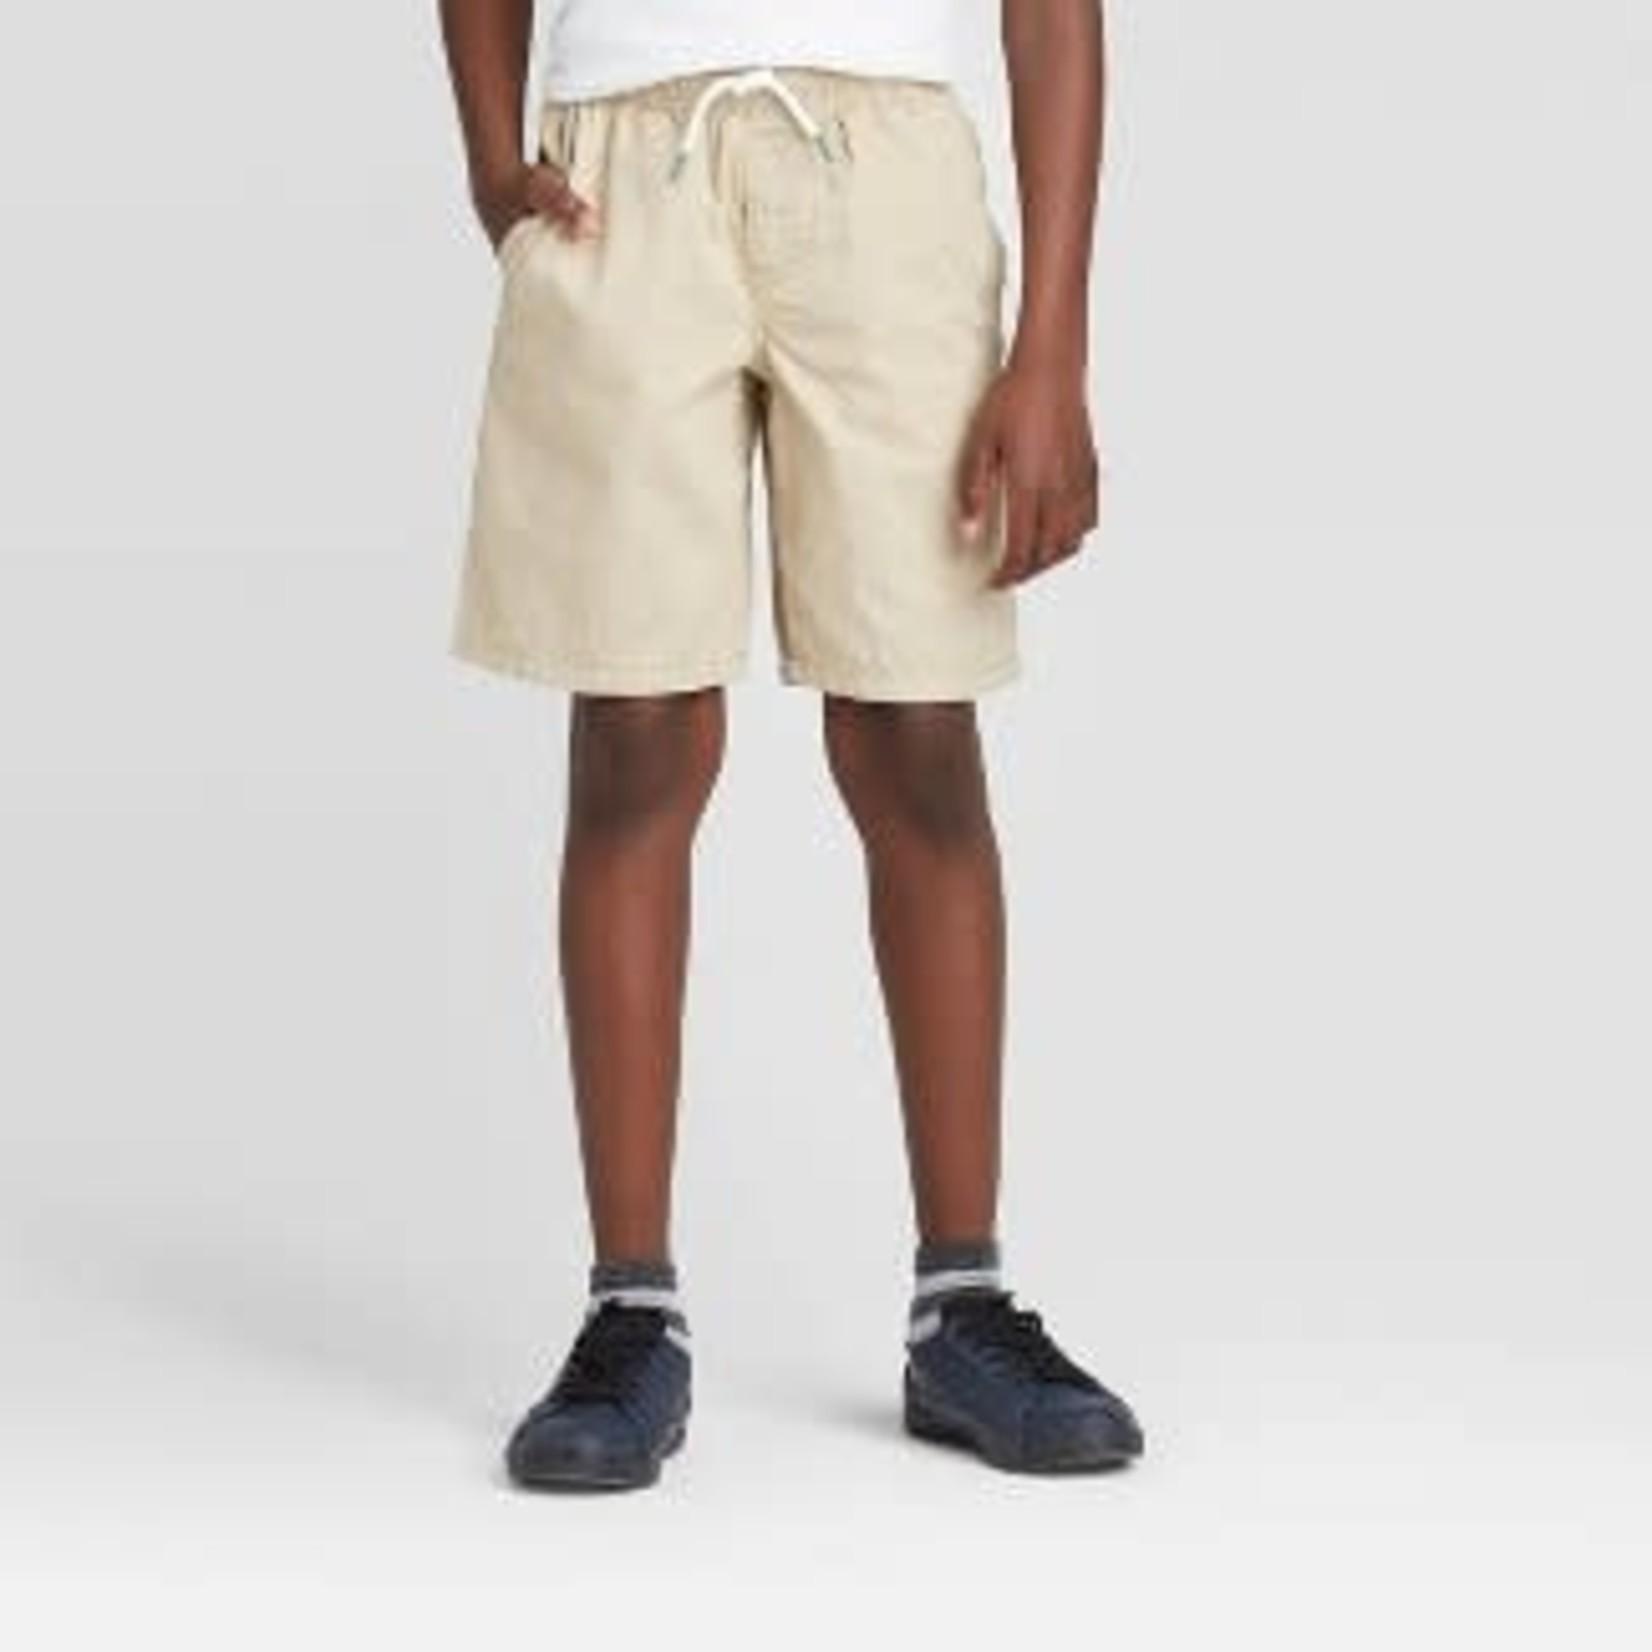 Cat & Jack Boys' Woven Pull-On Shorts -L 12/14